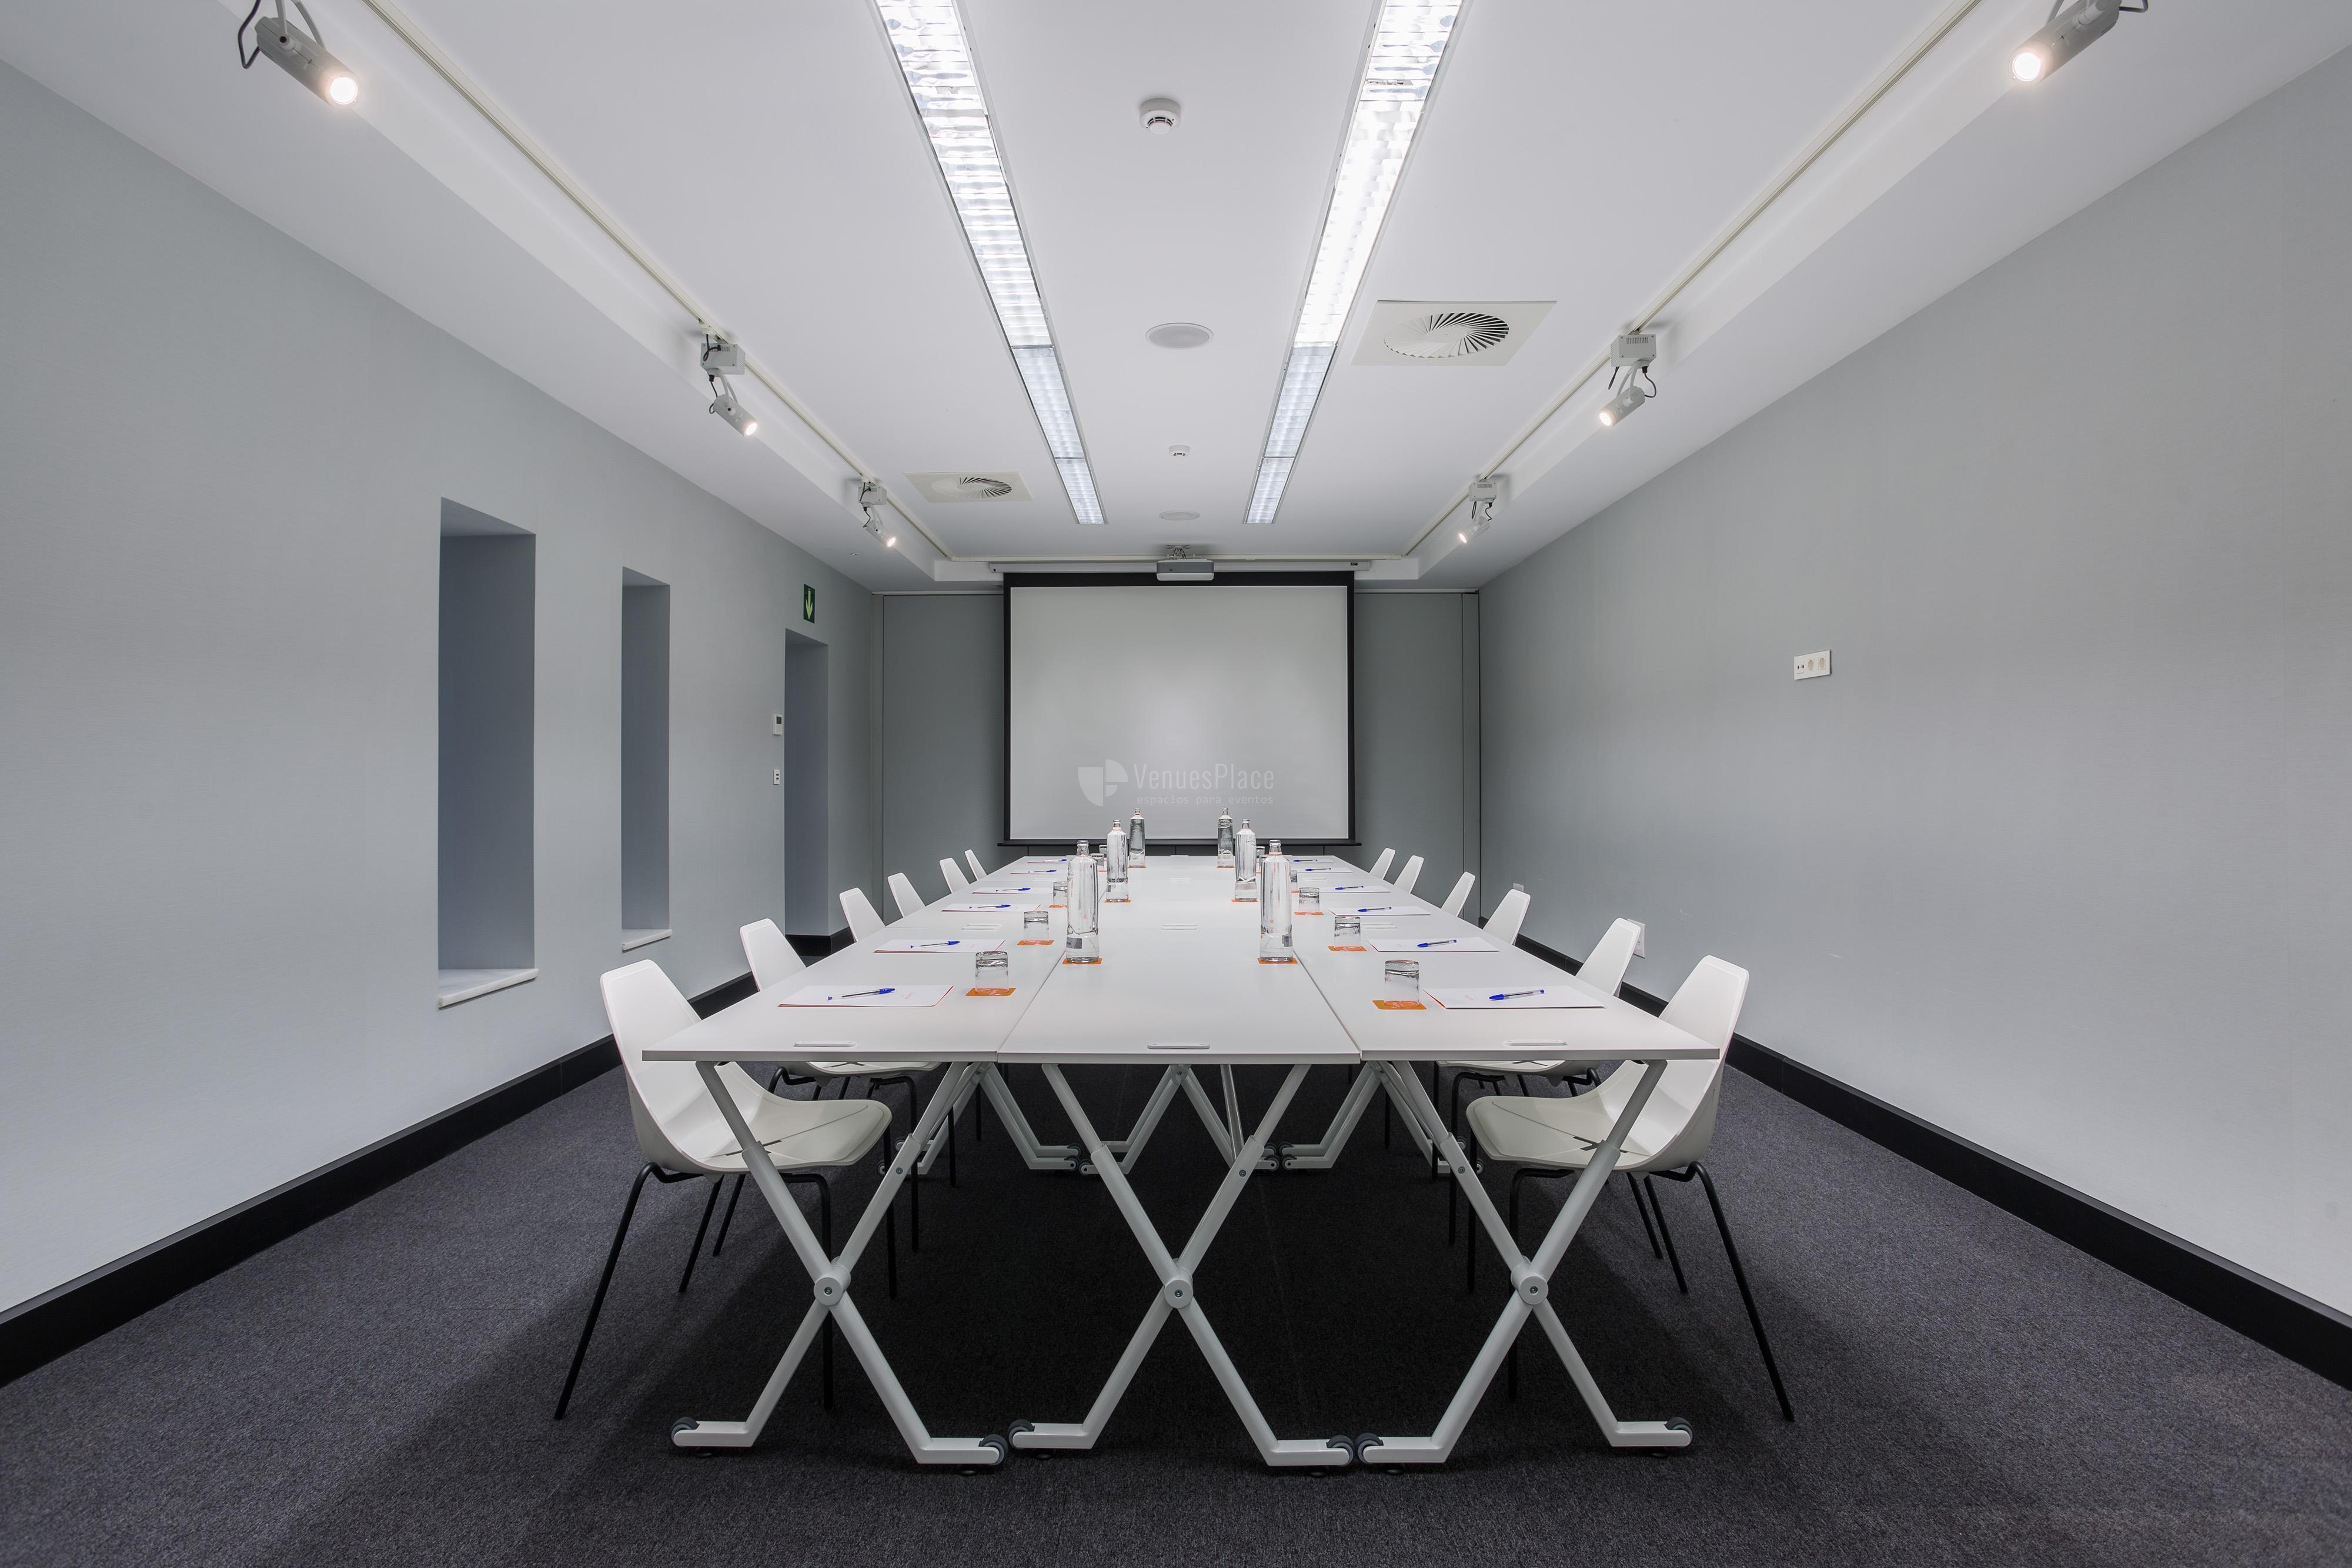 Montaje mesa imperial, eventos de empresa en Room Mate Valeria